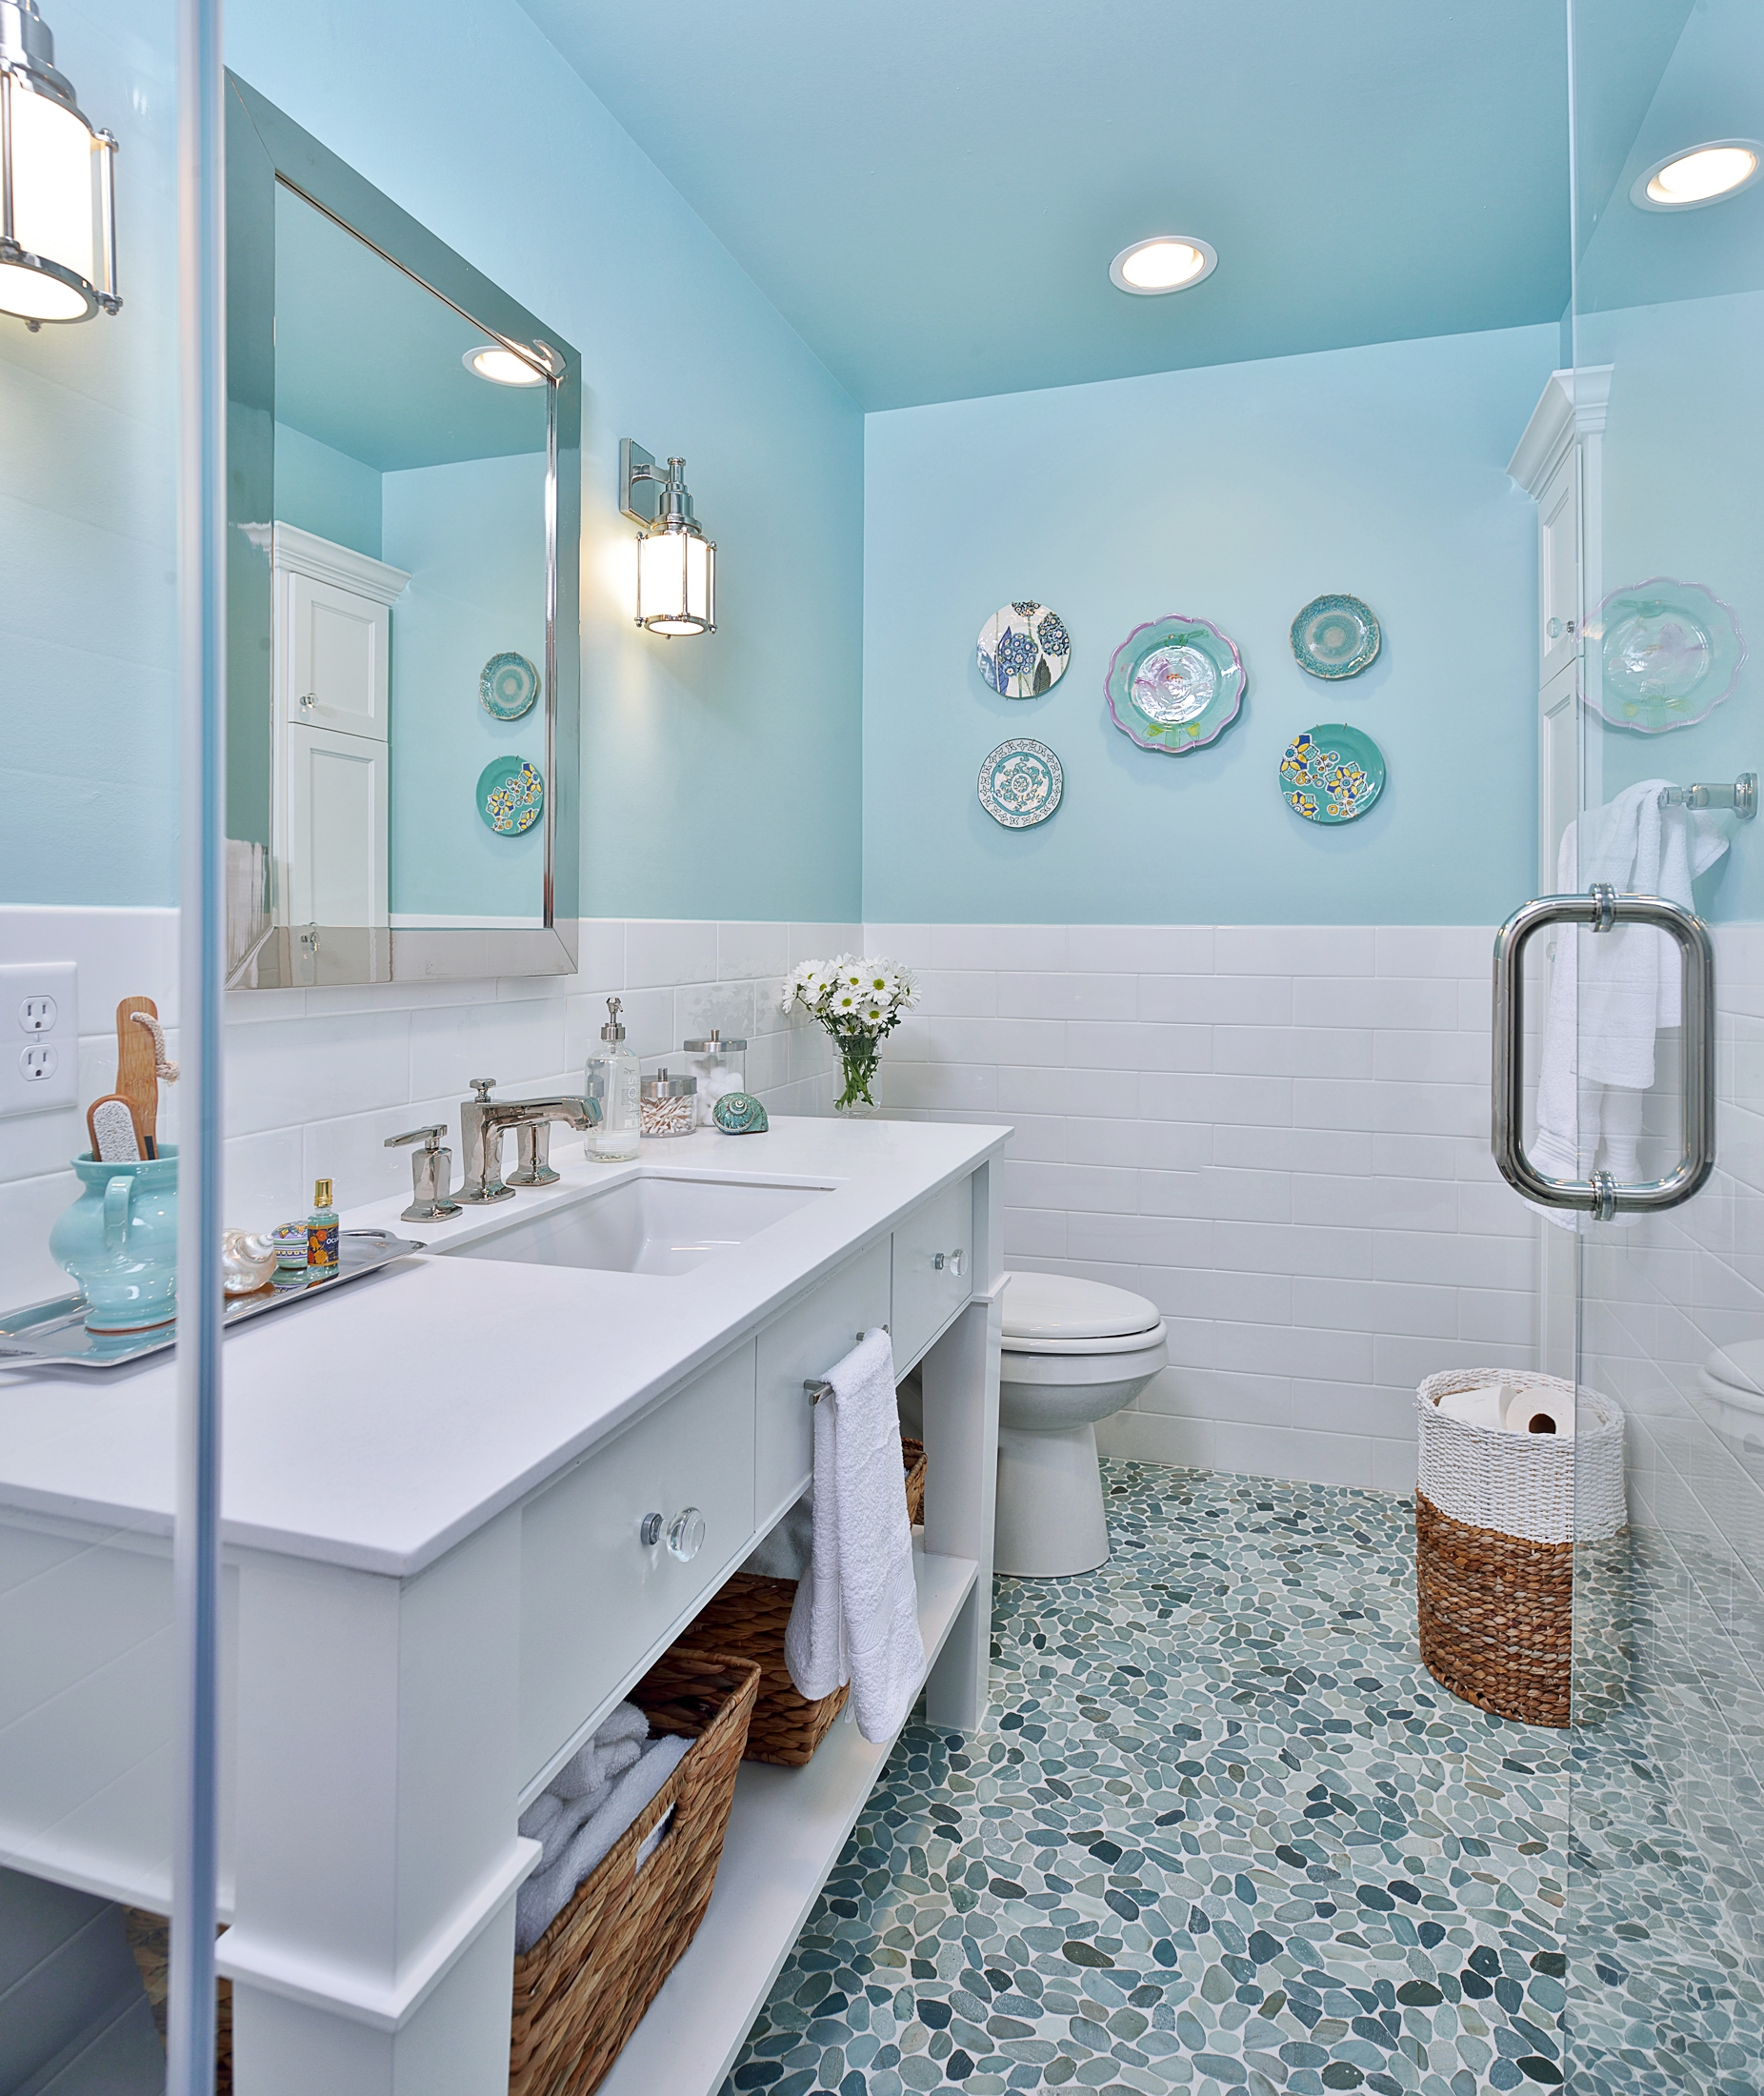 Tiffany blue bathroom remodel with pebble tile floor, Designer: Carla Aston